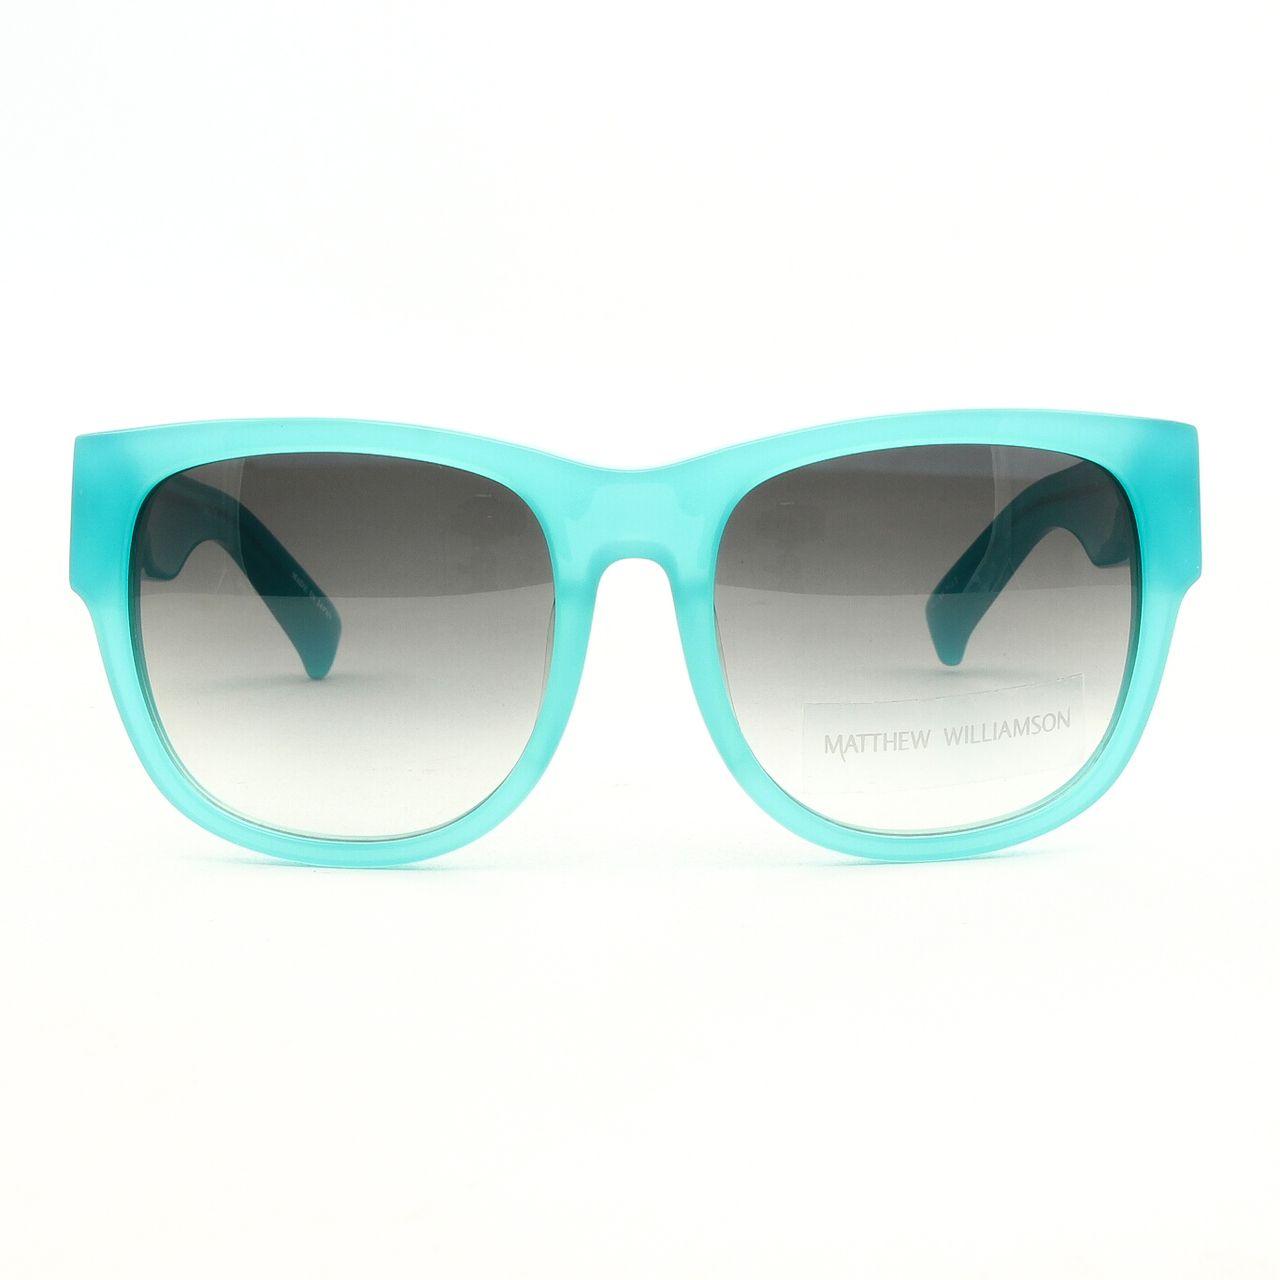 Matthew Williamson 17 C8 Sunglasses Col. Turquoise with ...